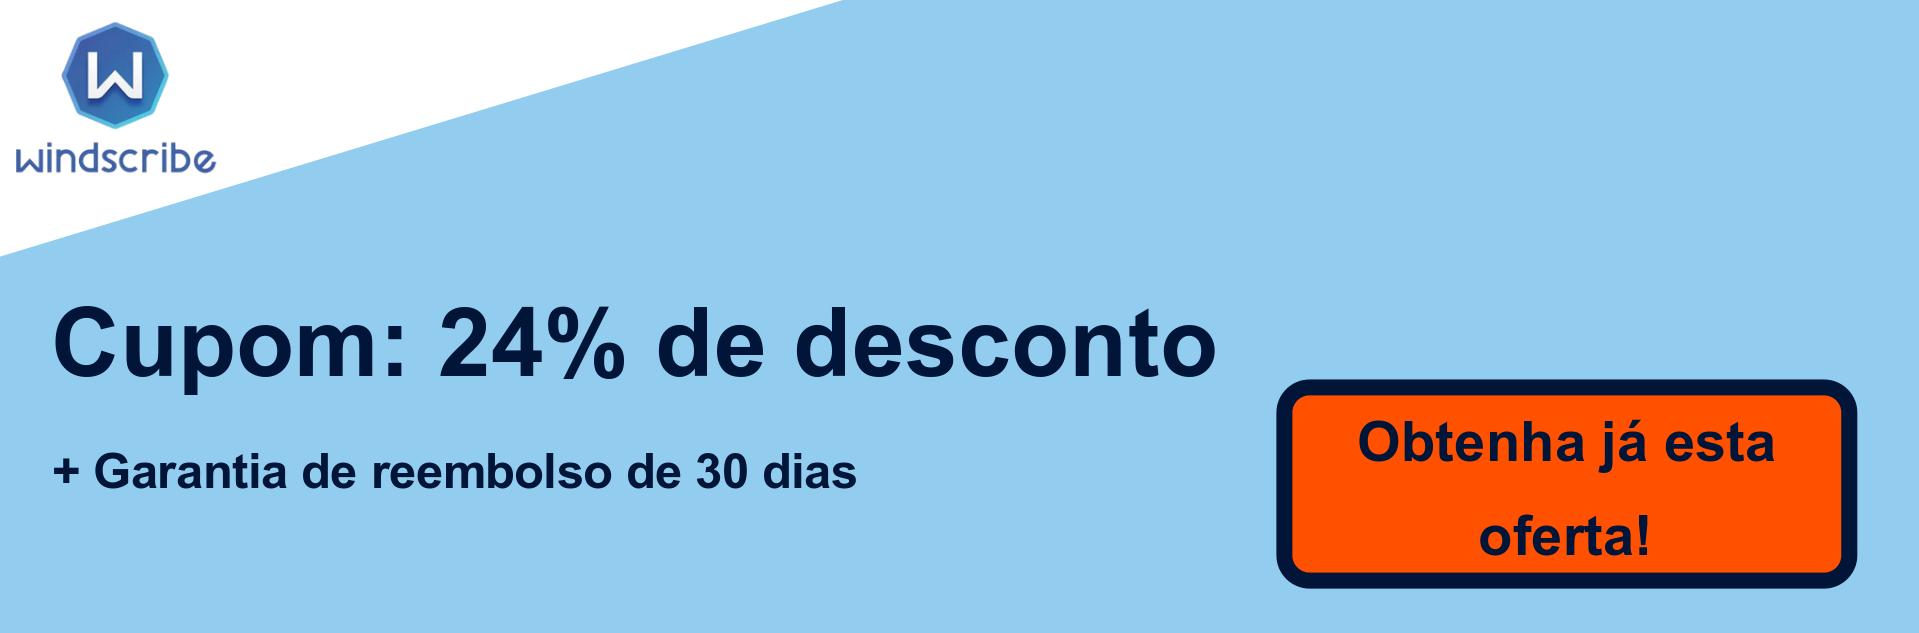 Banner com cupom de WindScribe VPN - 24% de desconto